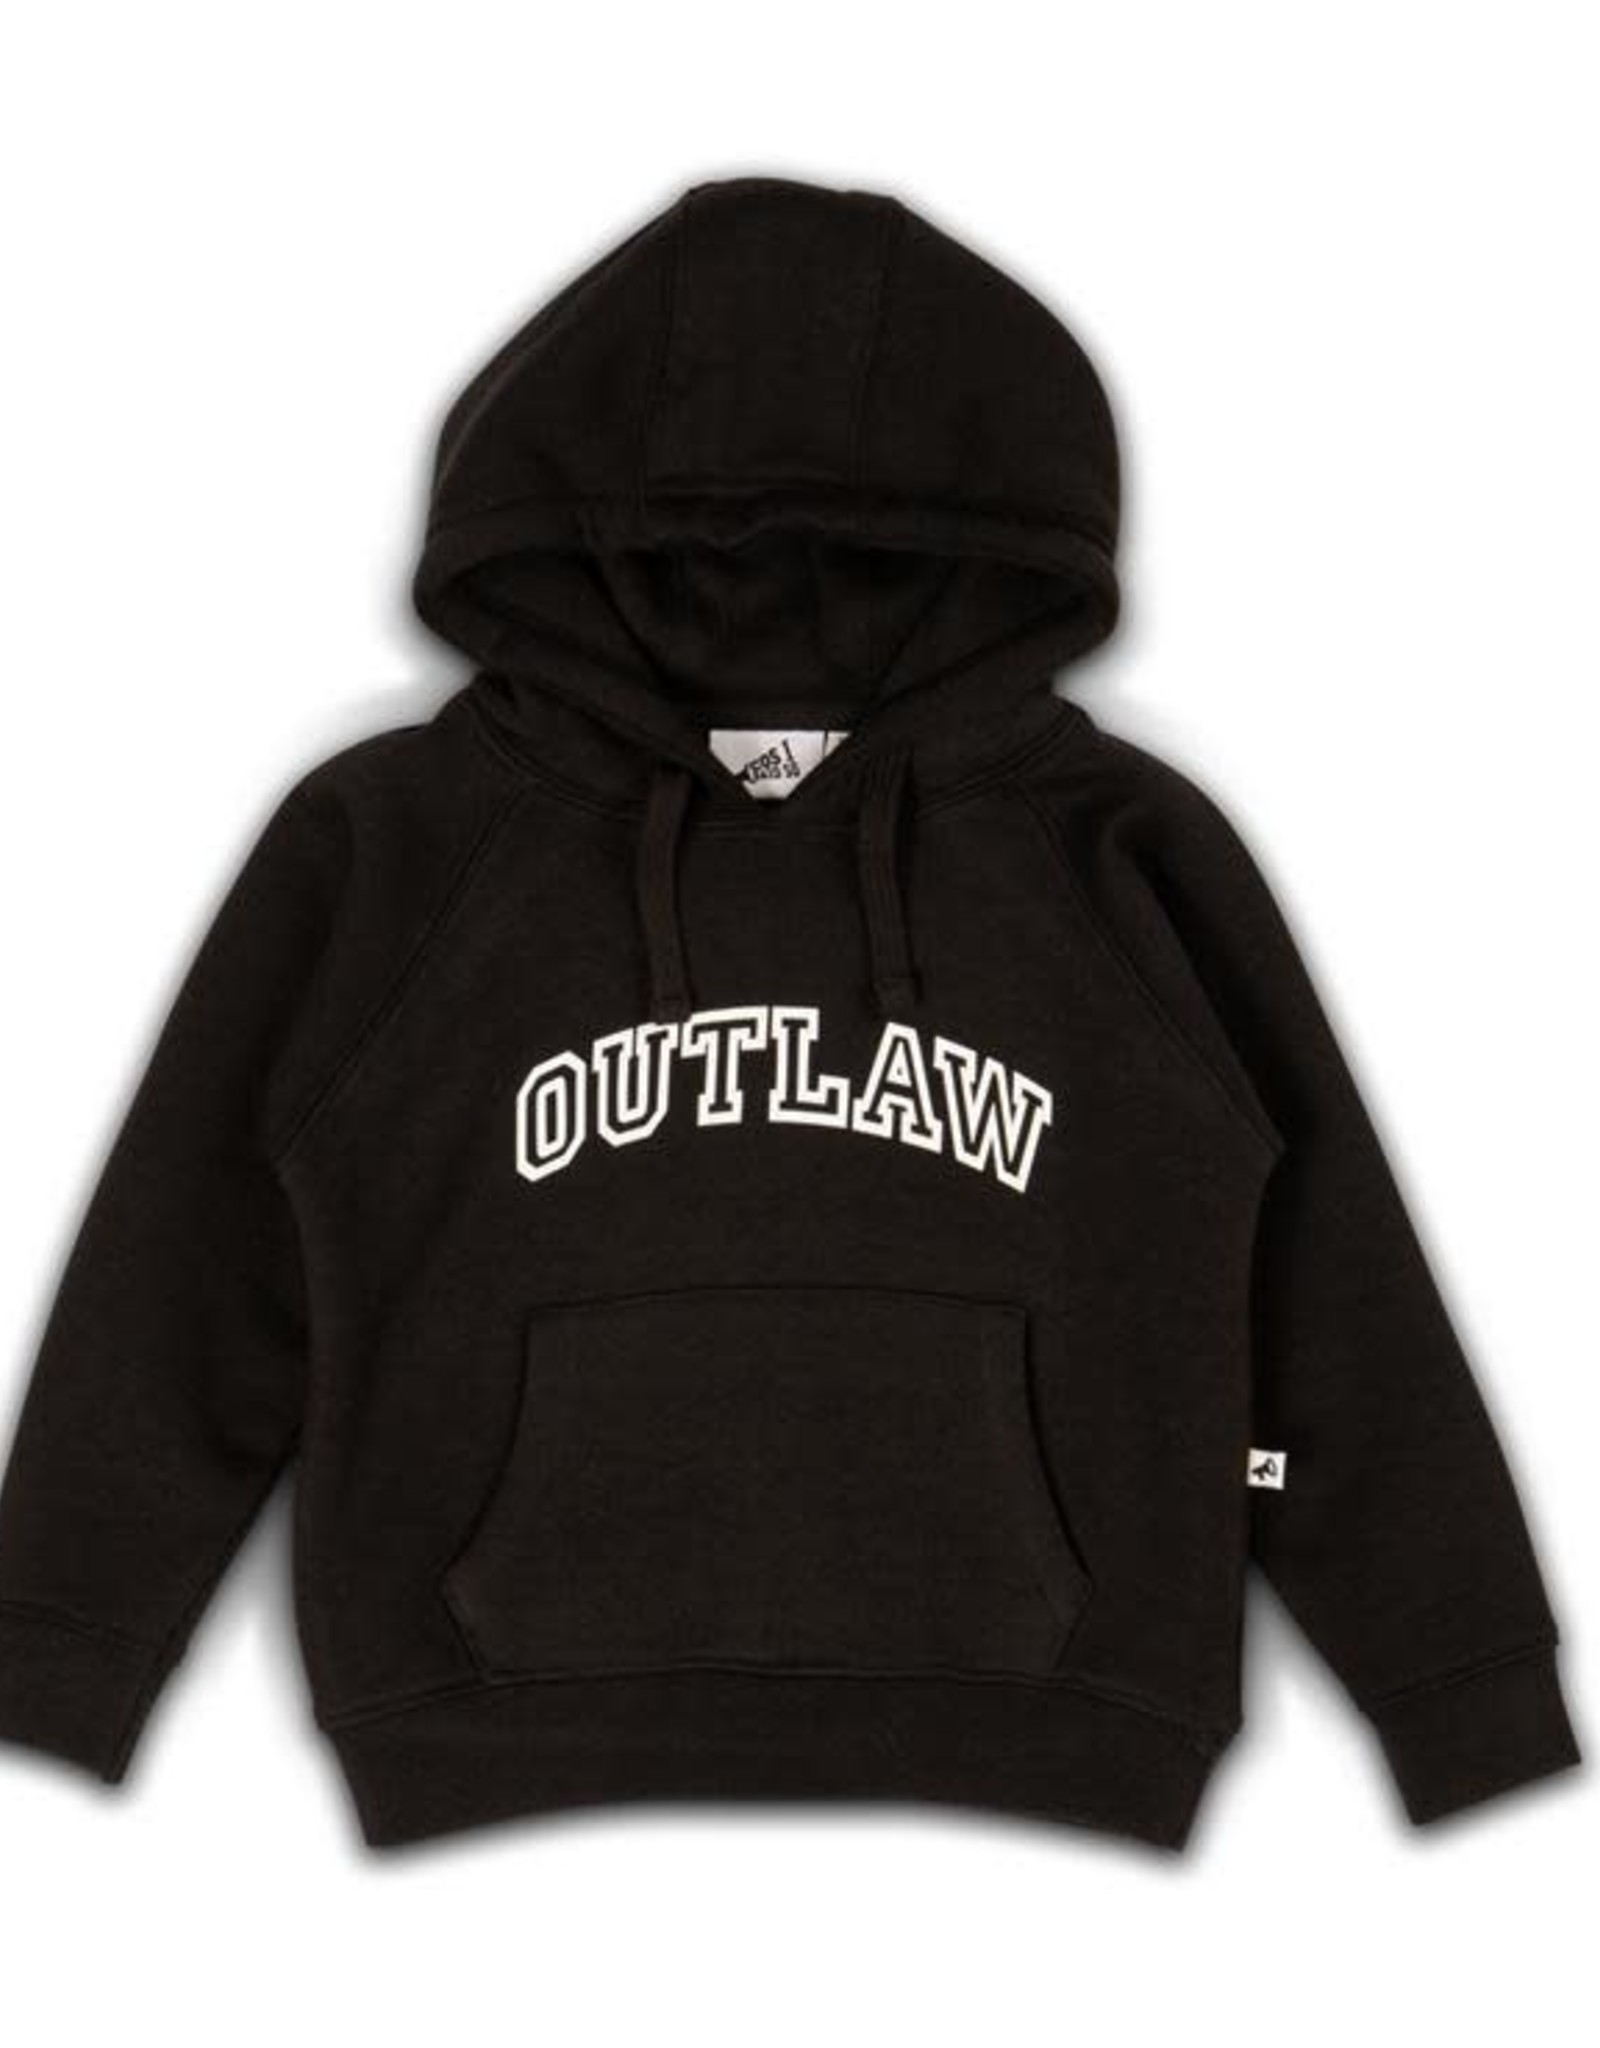 Cos i said so Cos i said so - Hooded sweater - outlaw